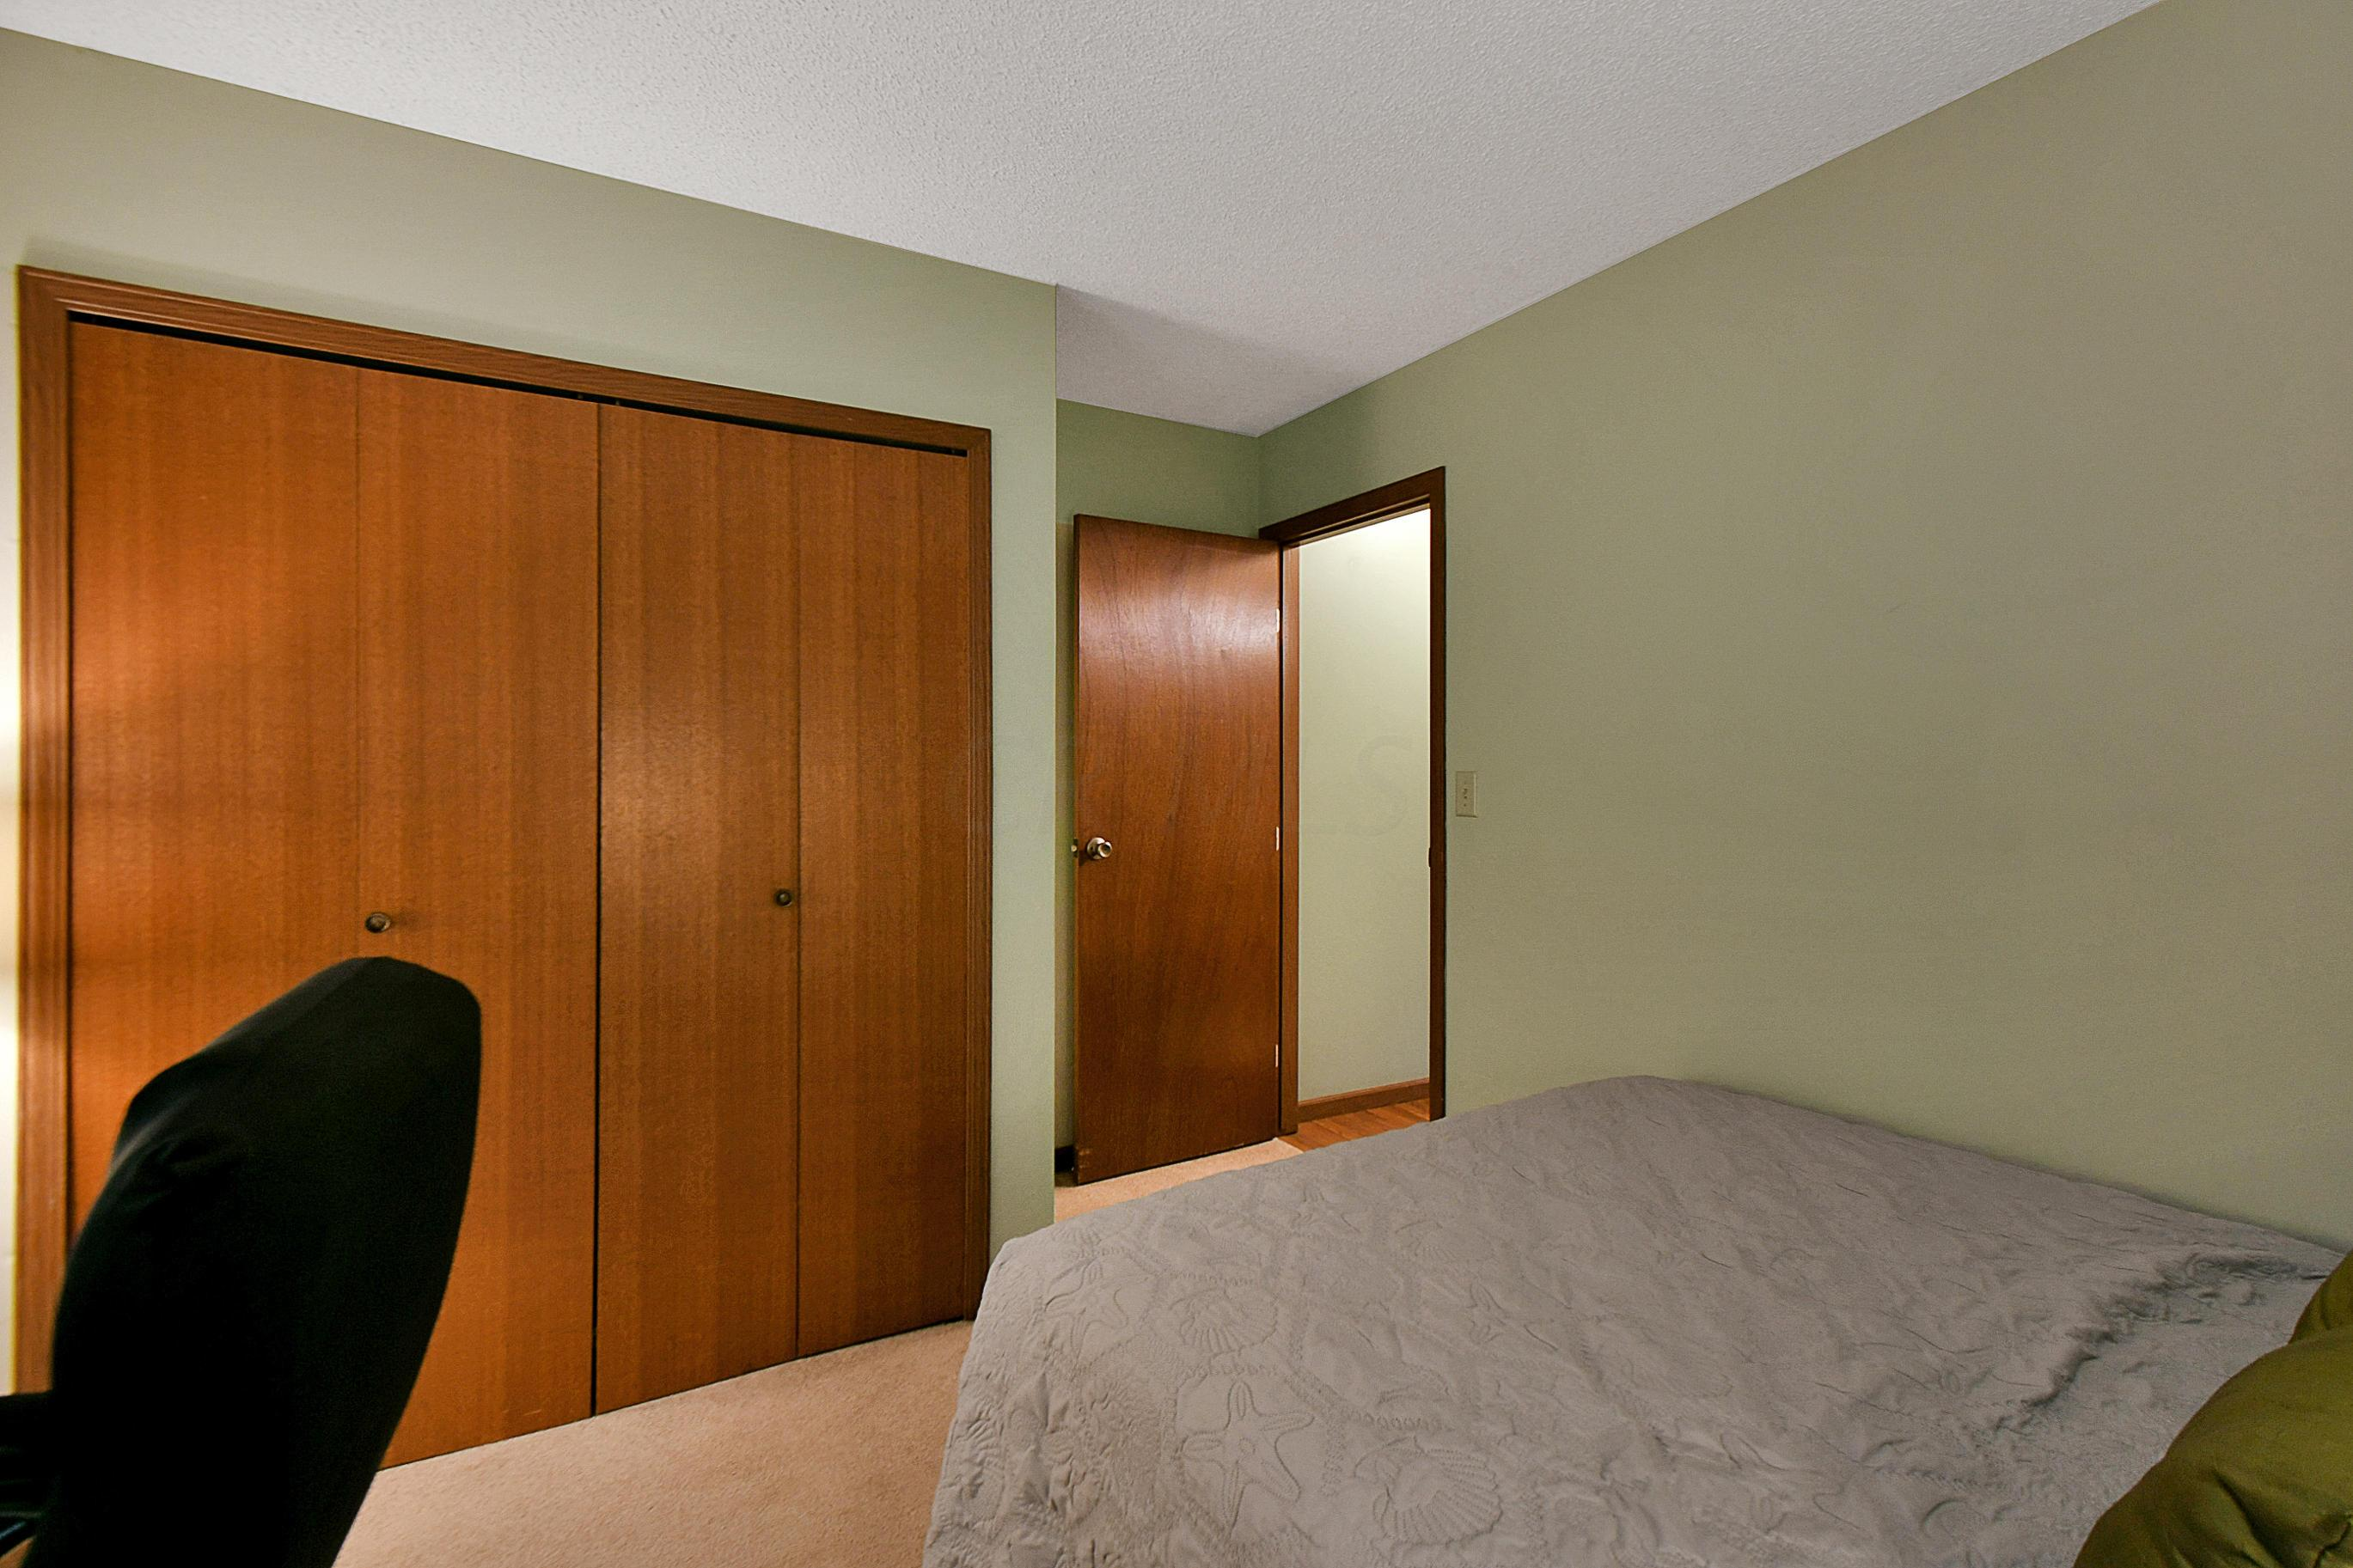 5912 Meadowhurst Way, Dublin, Ohio 43017, 3 Bedrooms Bedrooms, ,2 BathroomsBathrooms,Residential,For Sale,Meadowhurst,221000517